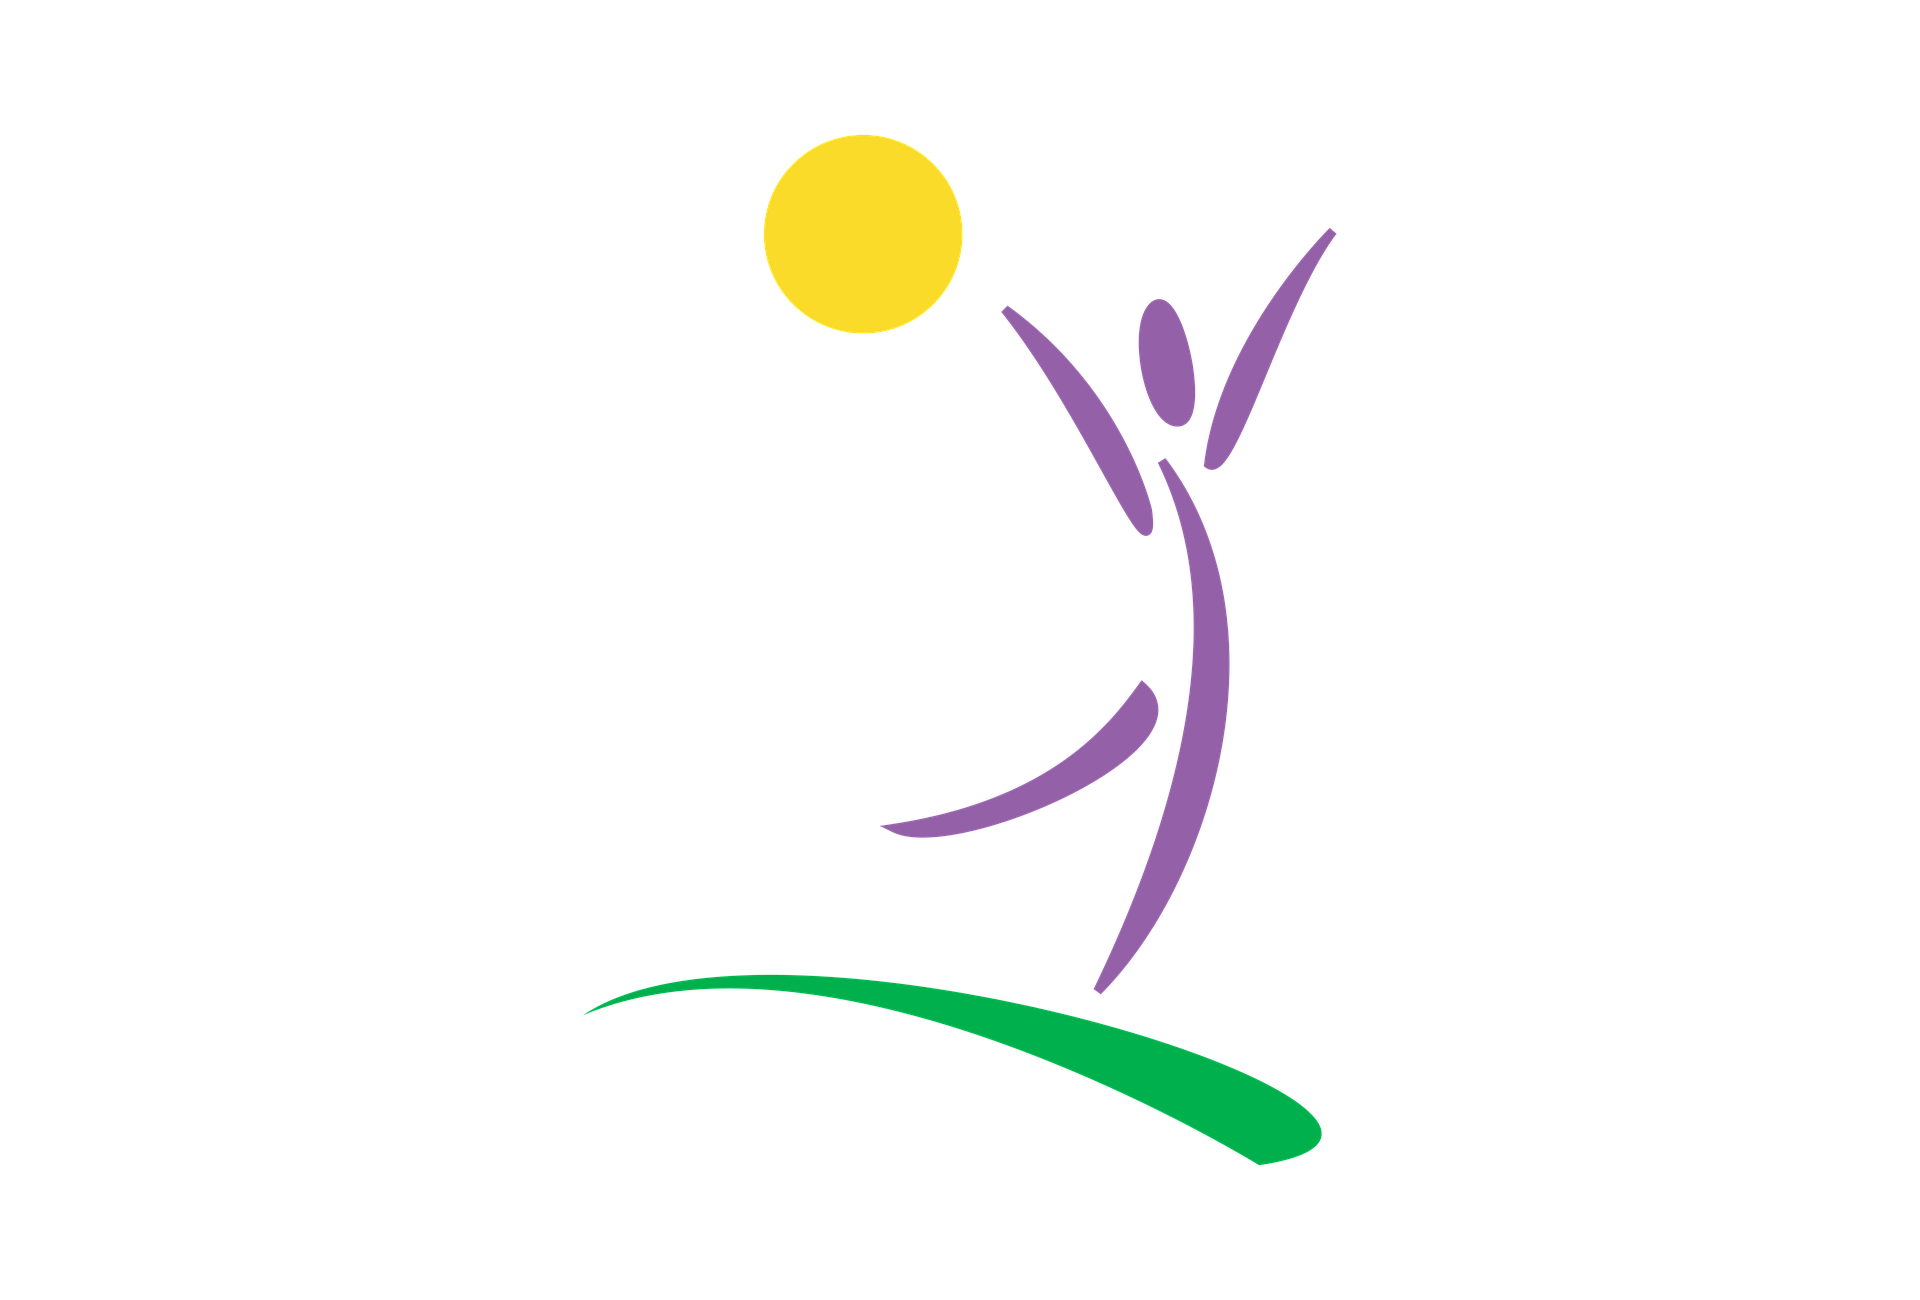 logo-3418132_1920